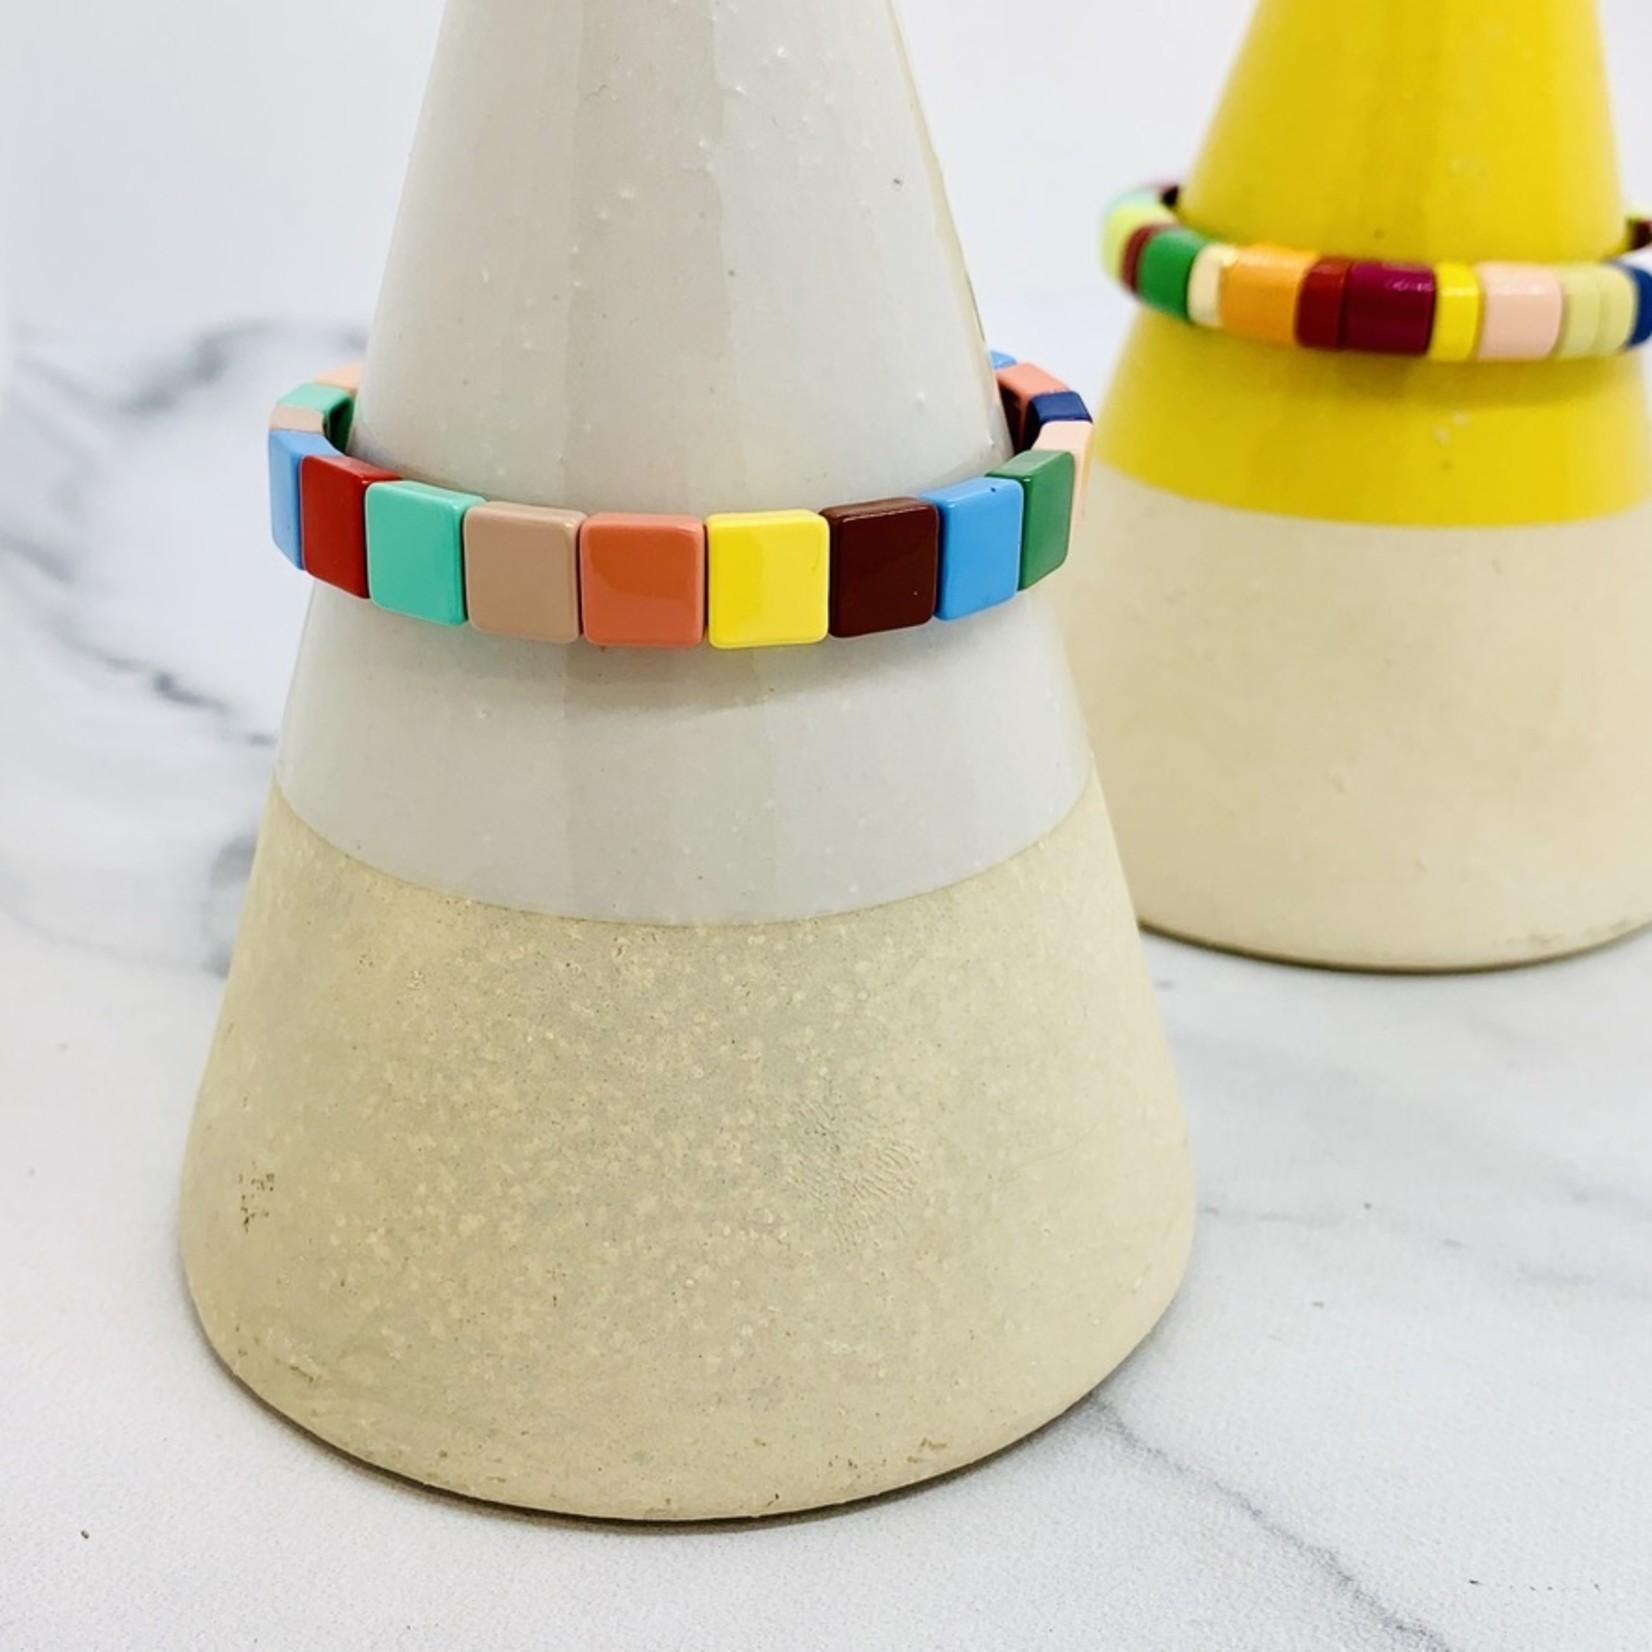 BeadBoat Tila Tile Stretch Bracelet